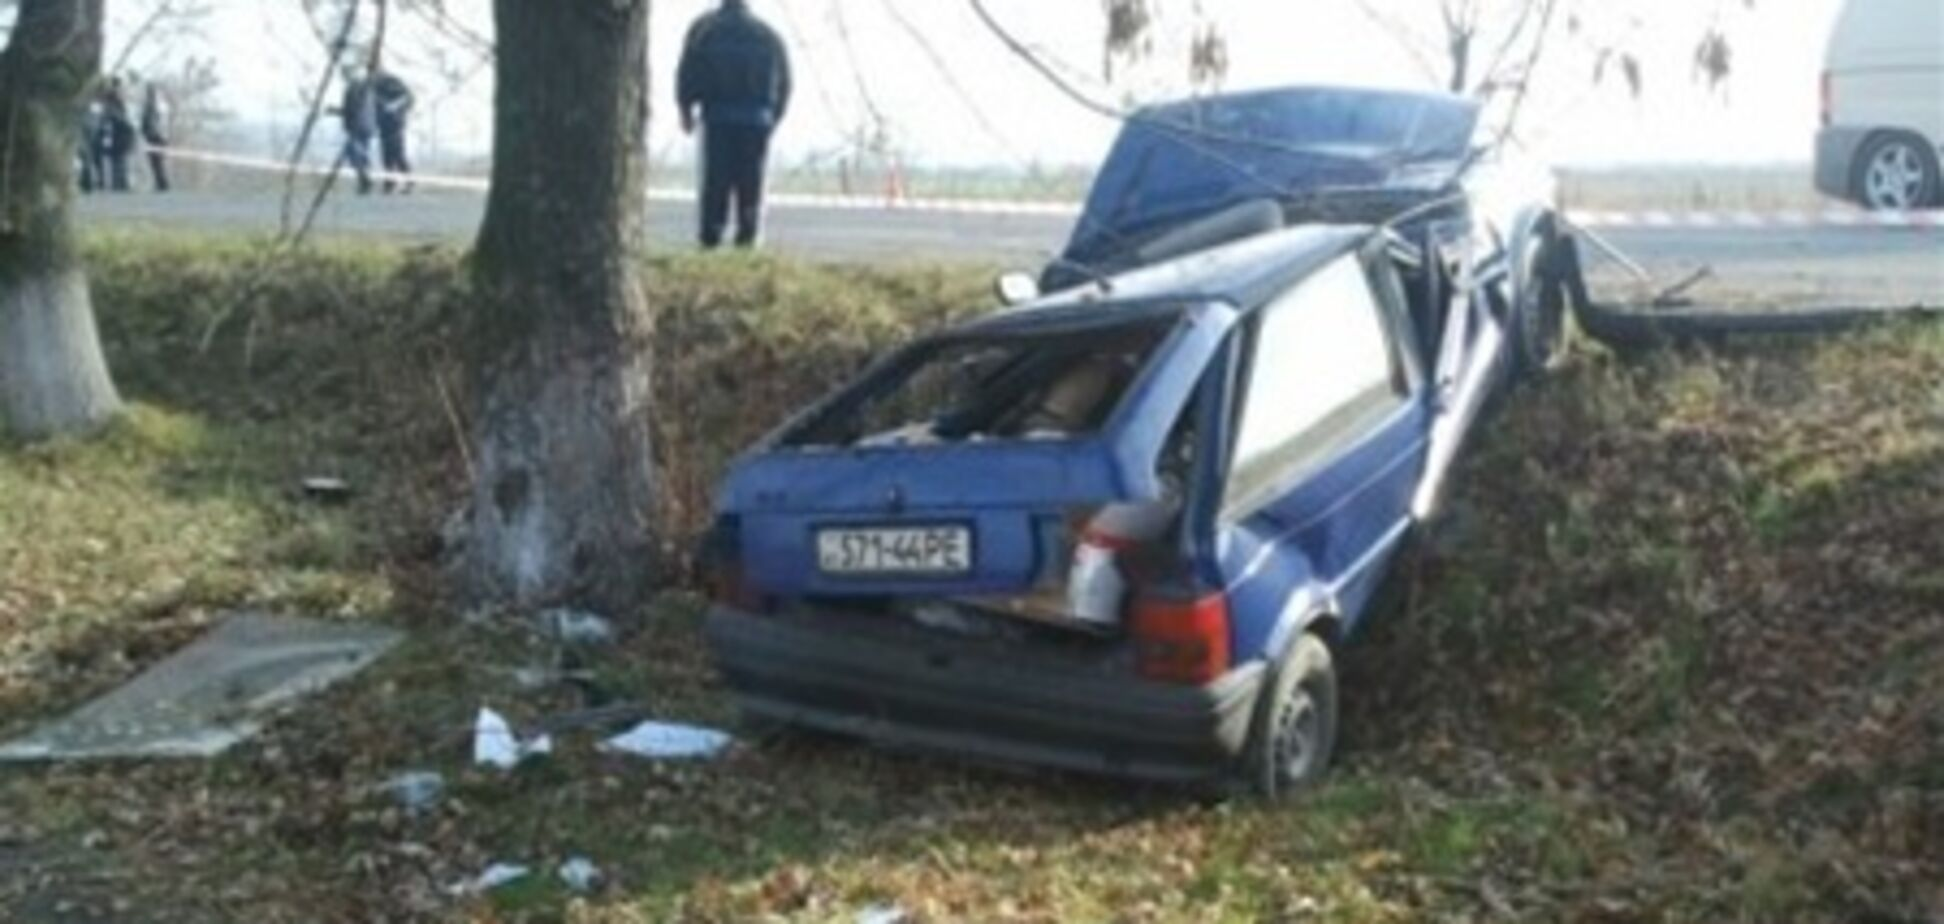 Ситуация на дорогах 22 ноября: 94 ДТП, 23 погибших